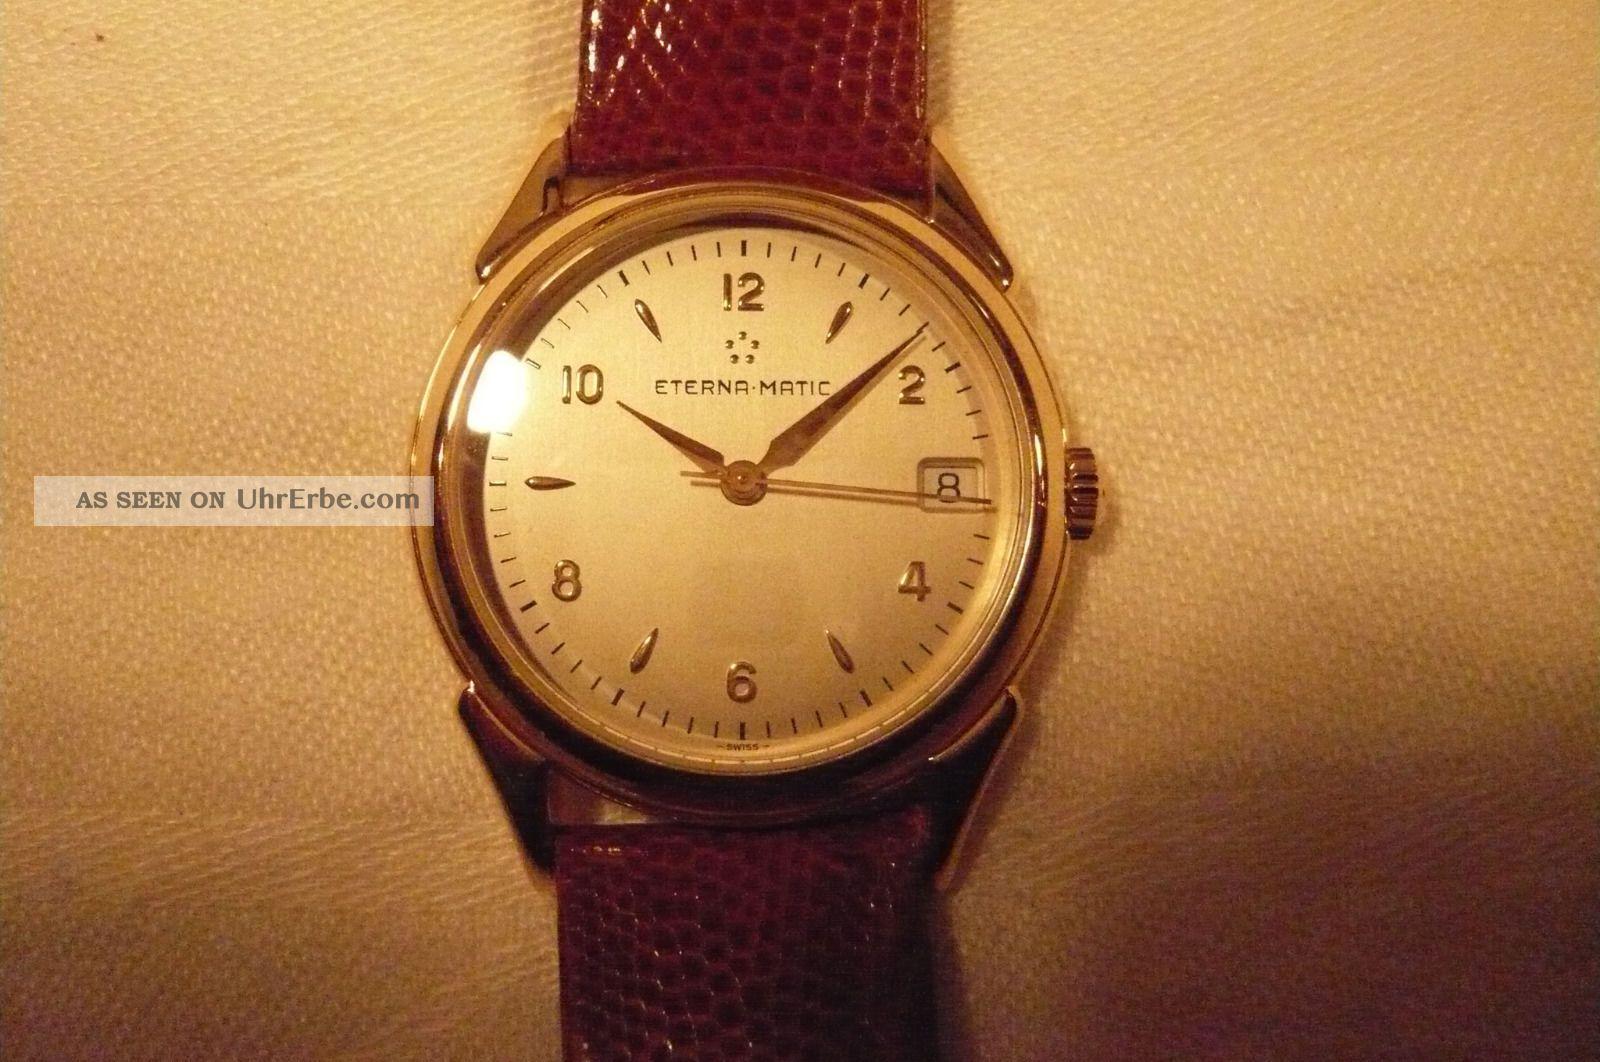 Eterna - Matic 1948 Mit Nach Revision Armbanduhren Bild